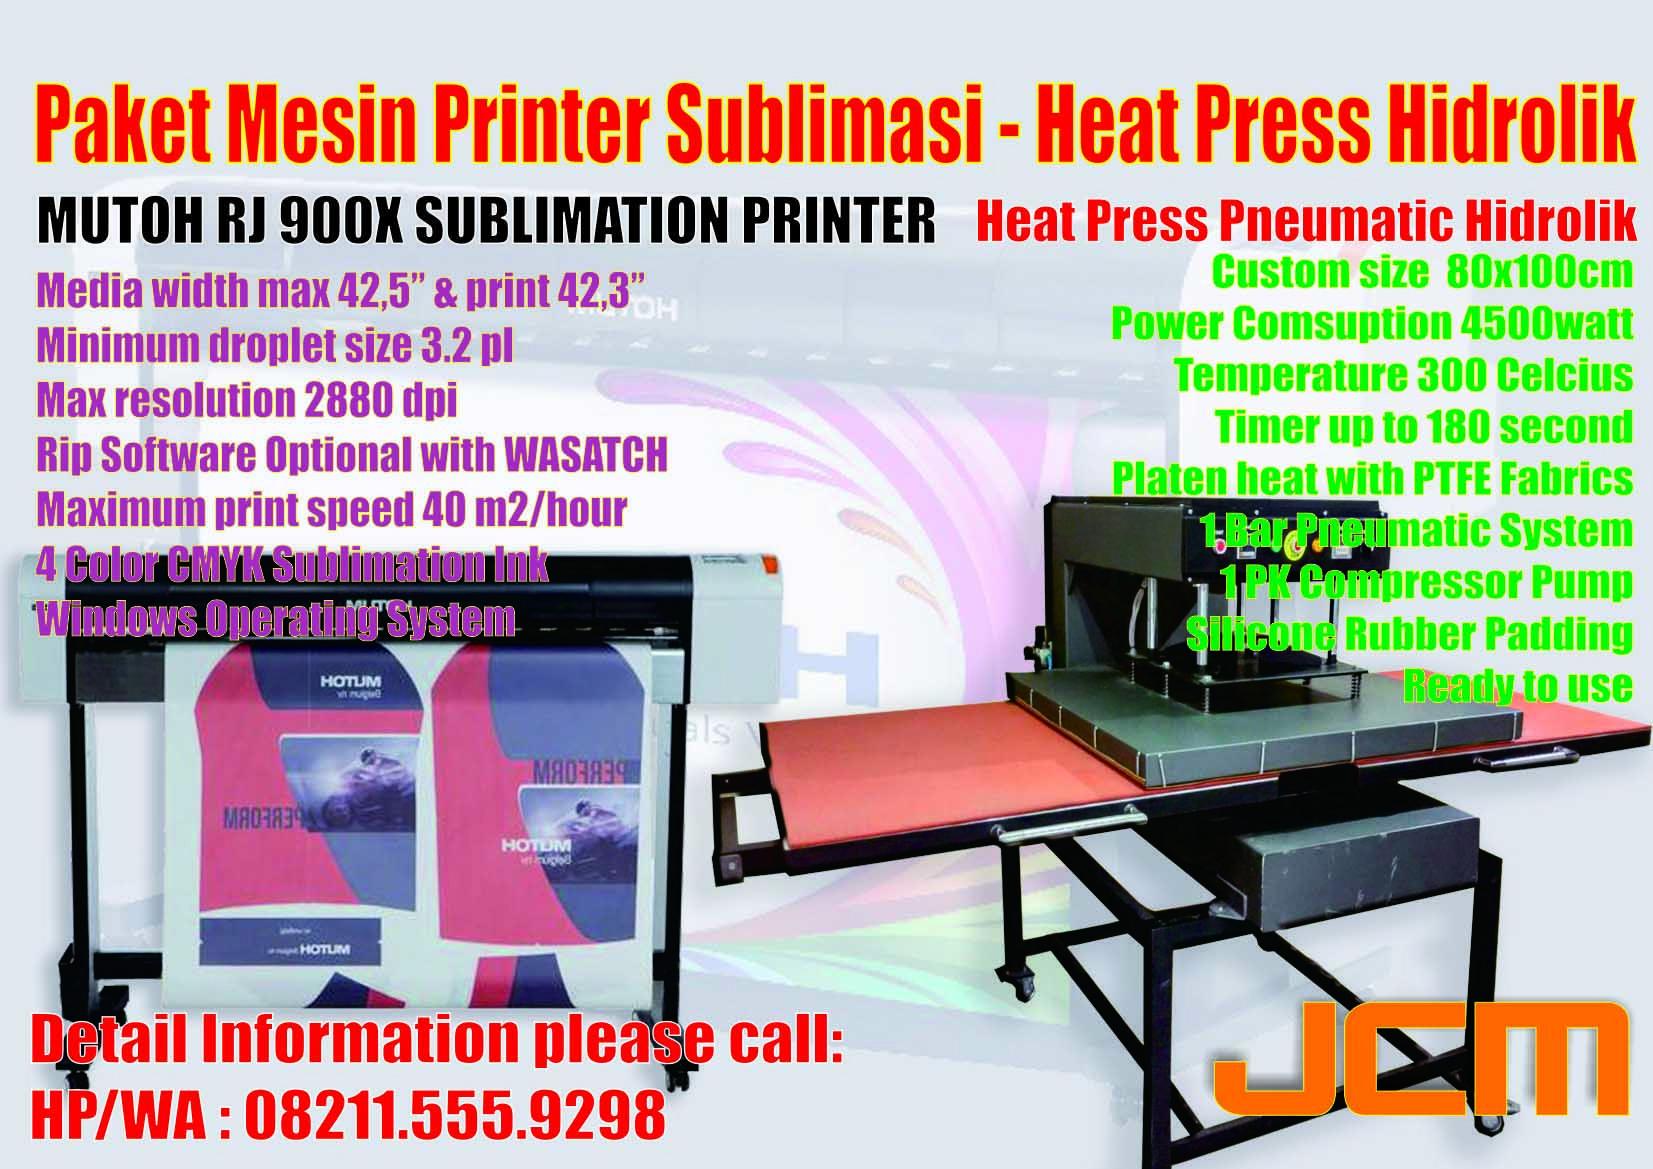 JUAL MESIN PRINTER HARGA SUBLIM SUBLIME SUBLIMASI EPSON FC6270 MUTOH RJ 900X